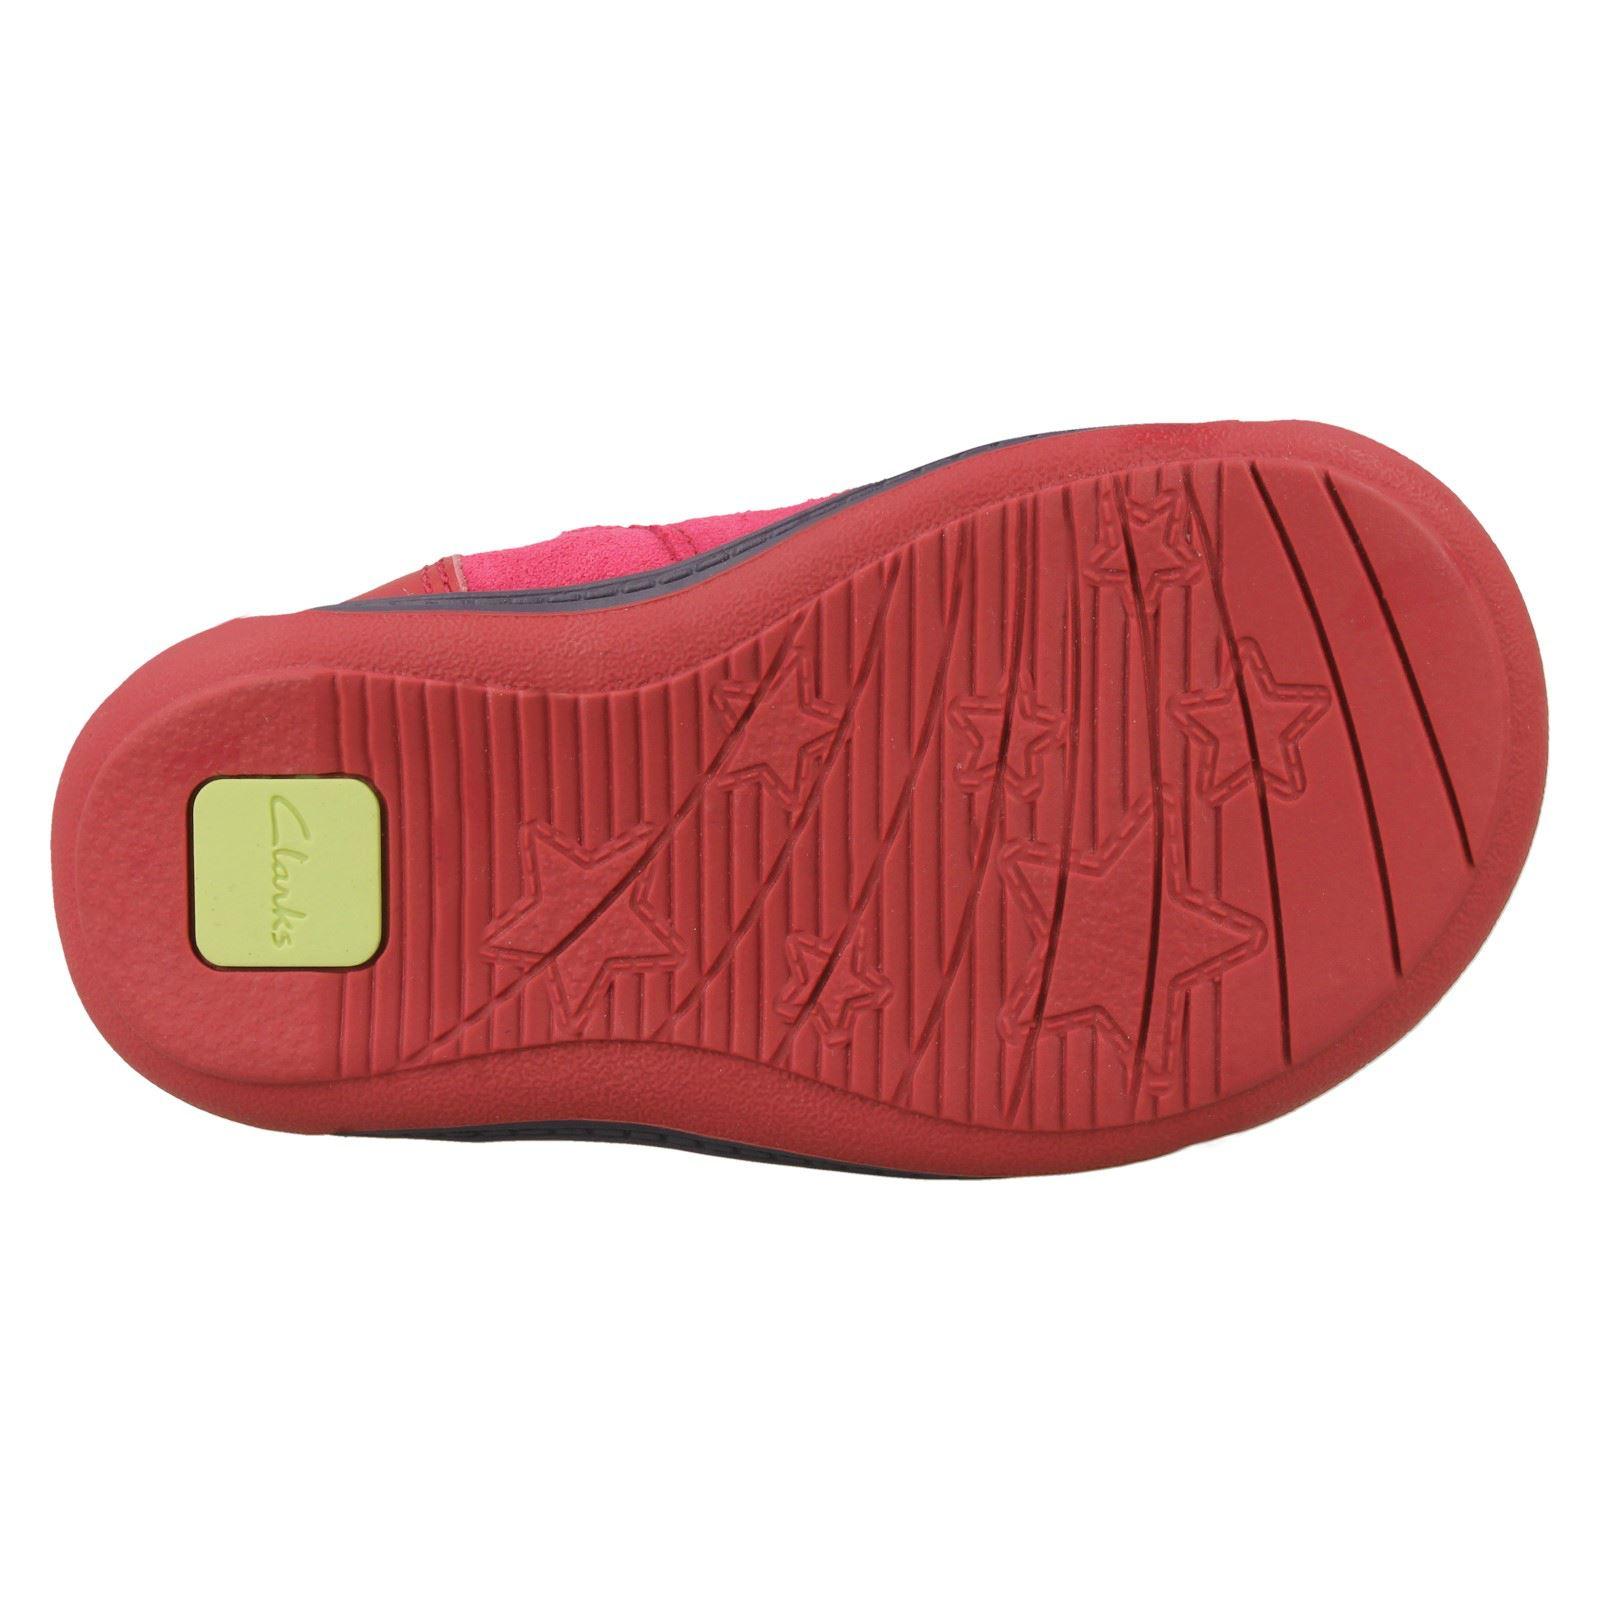 Clarks-Girls-Boots-with-Rabbit-Design-Iva-Friend